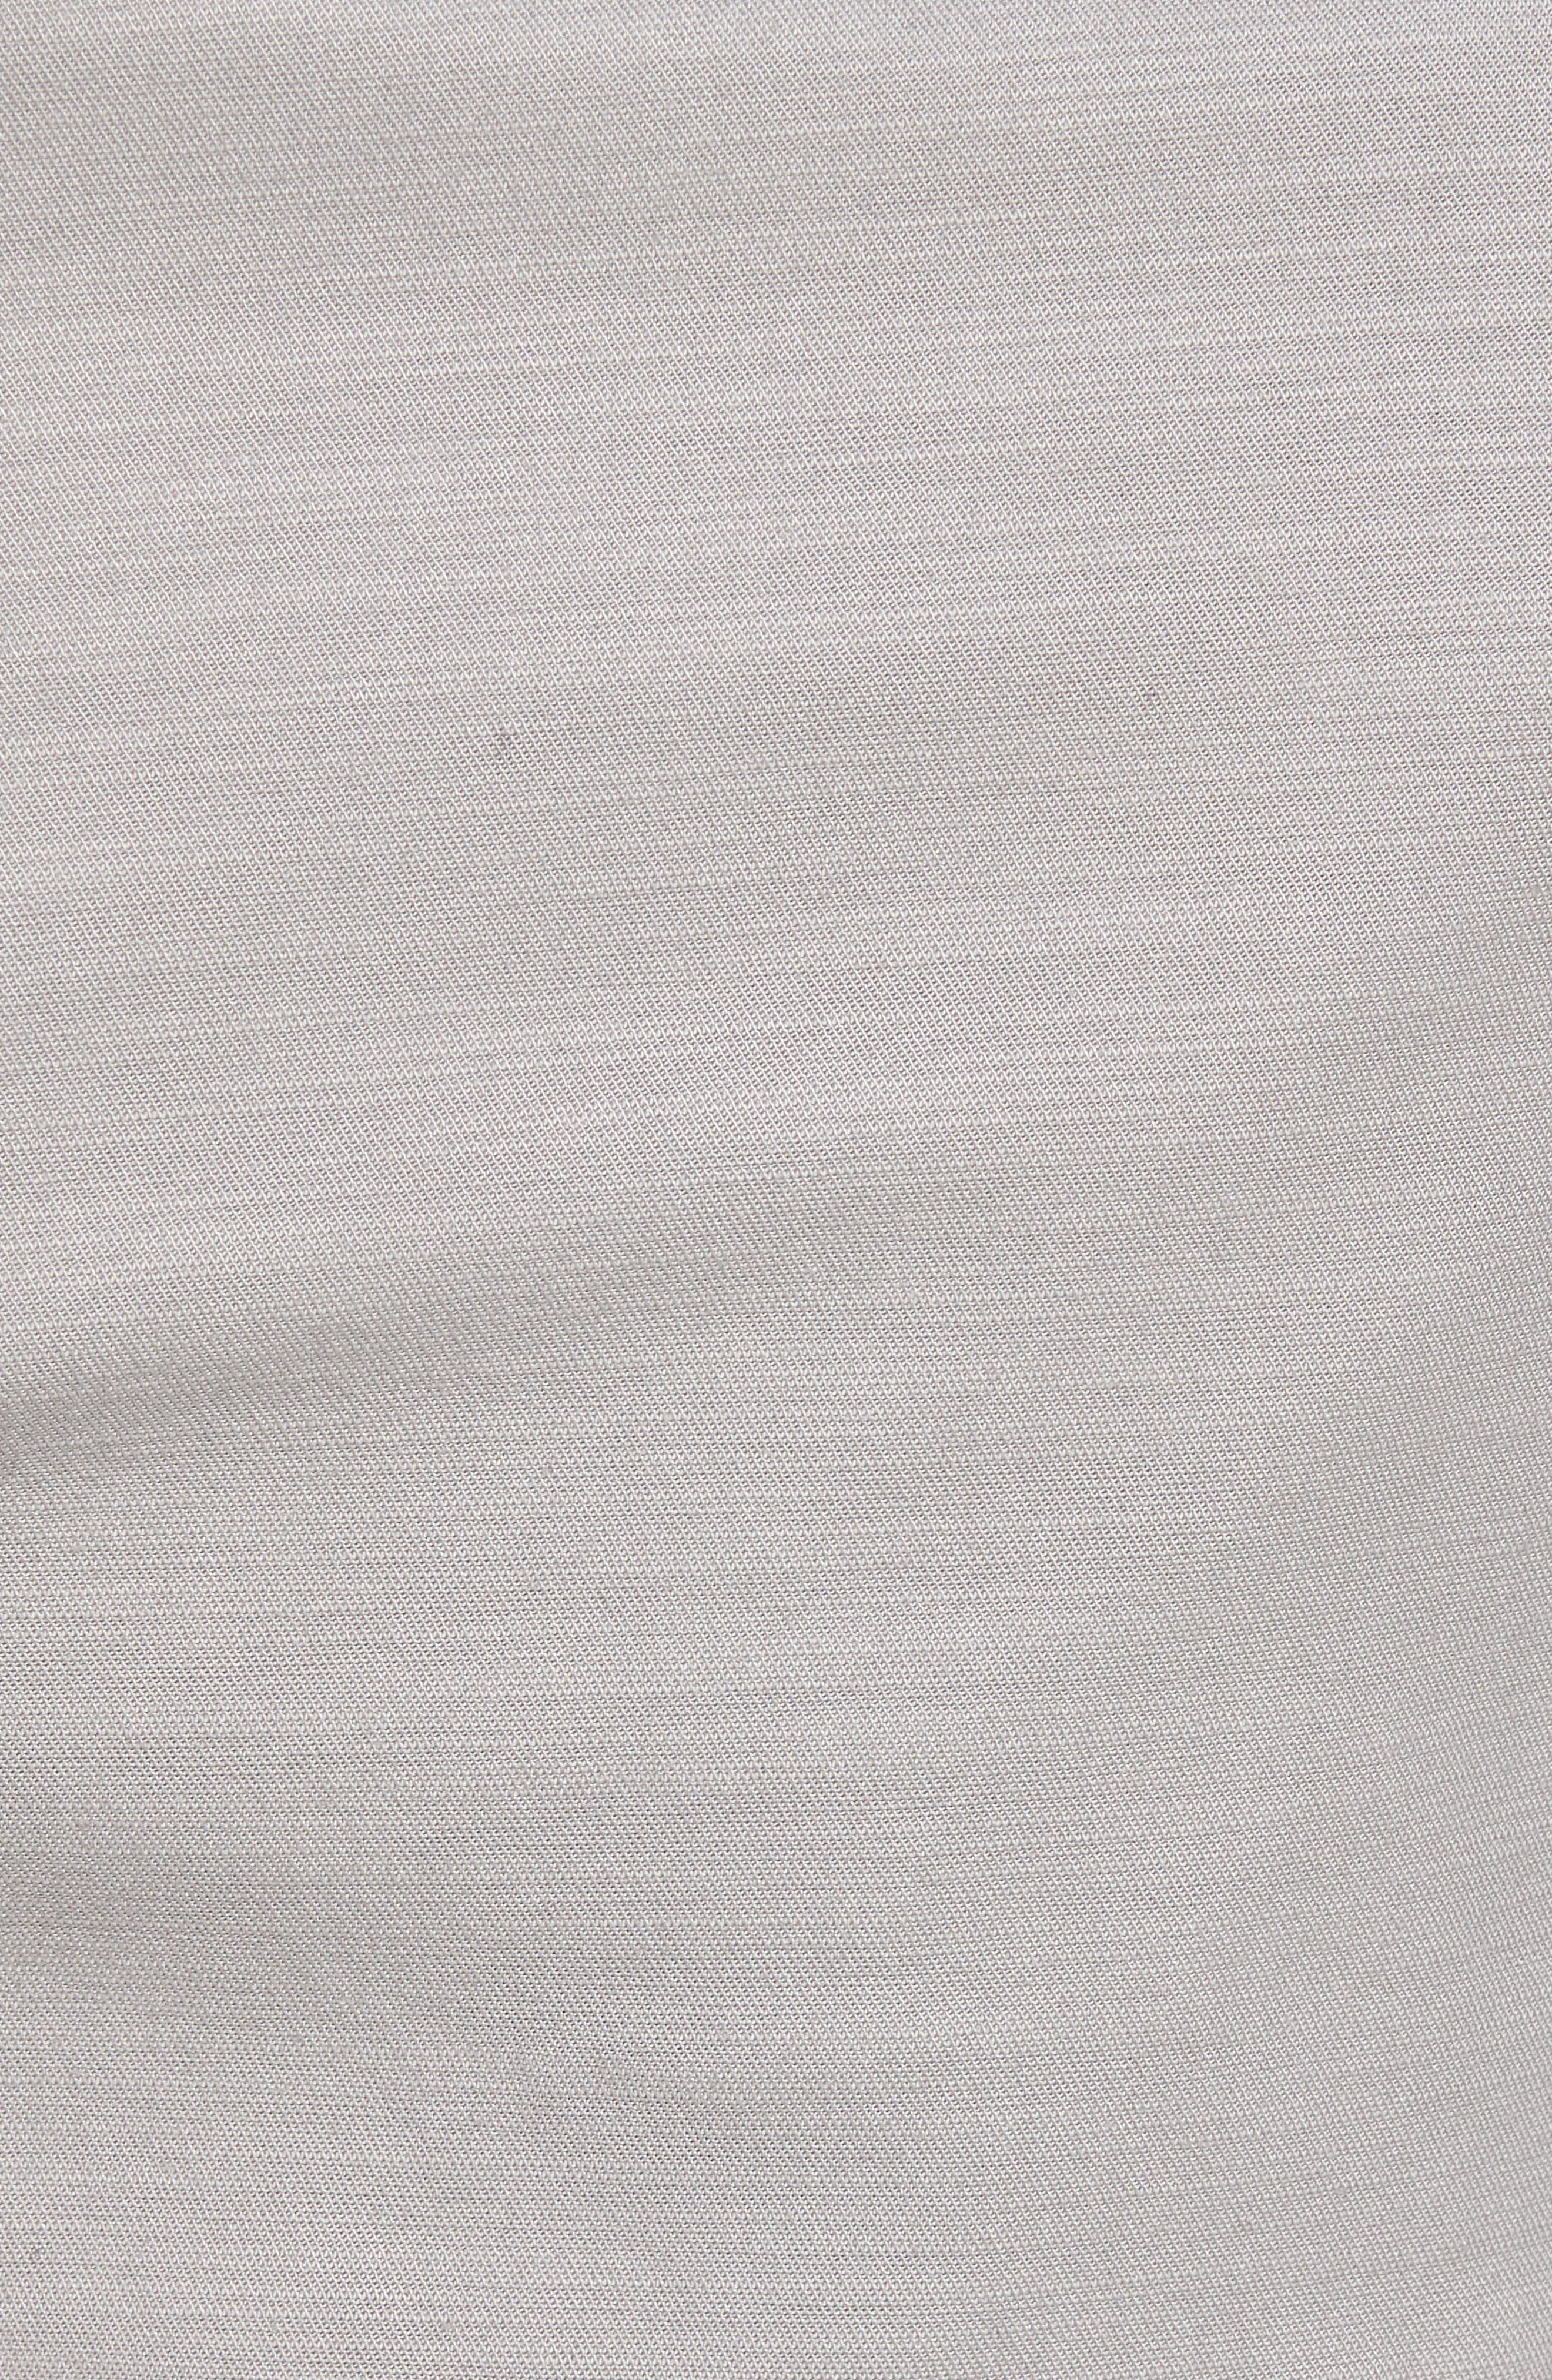 Jay Stretch Chino Shorts,                             Alternate thumbnail 5, color,                             LIGHT GREY